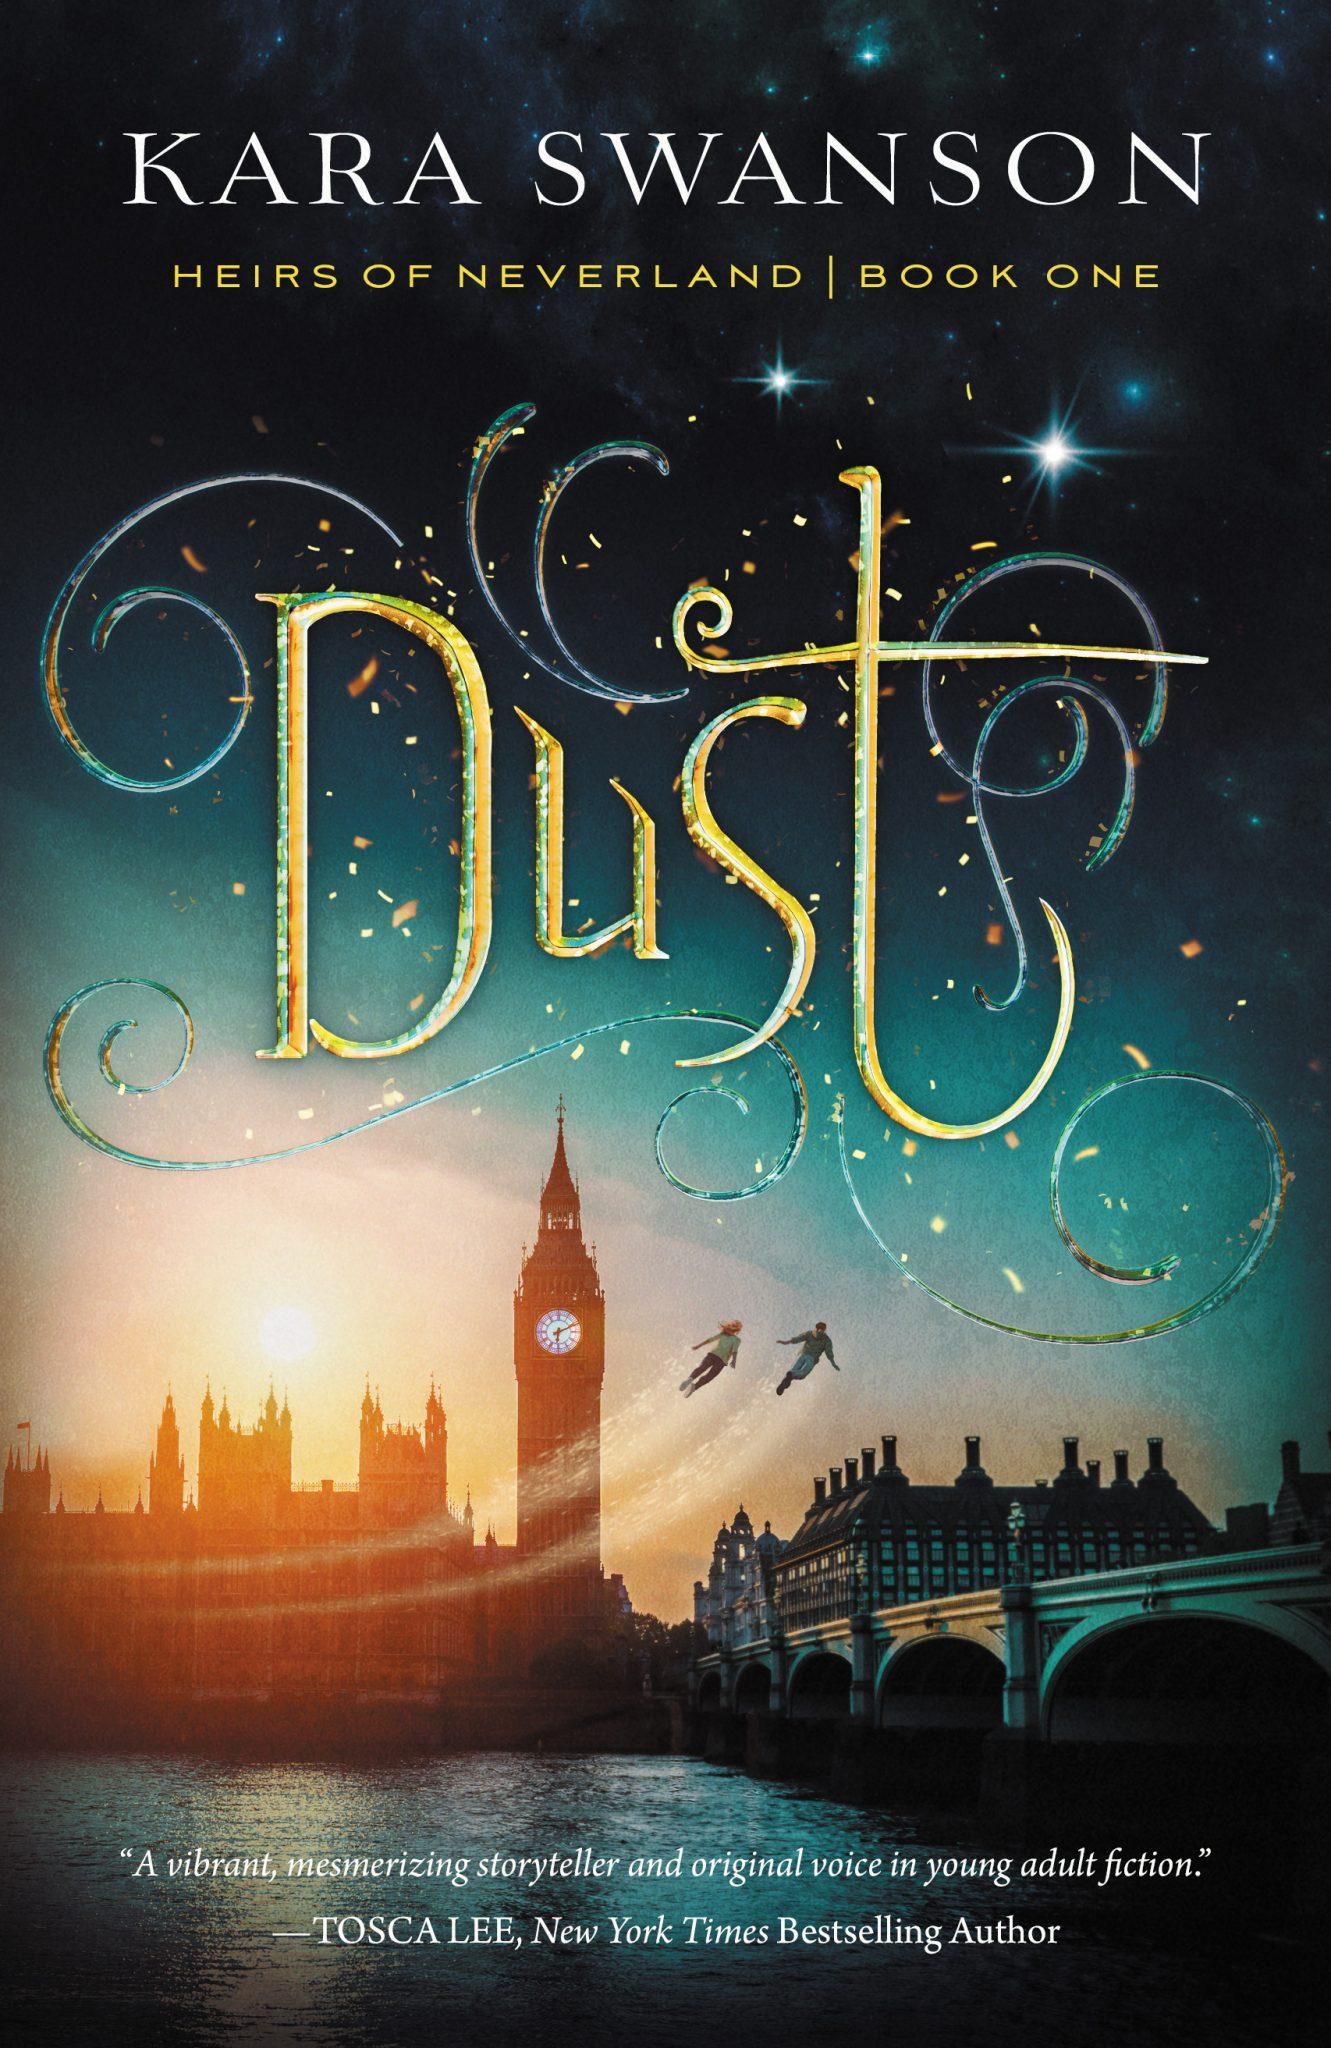 Dust-by-Kara-Swanson-1331x2048